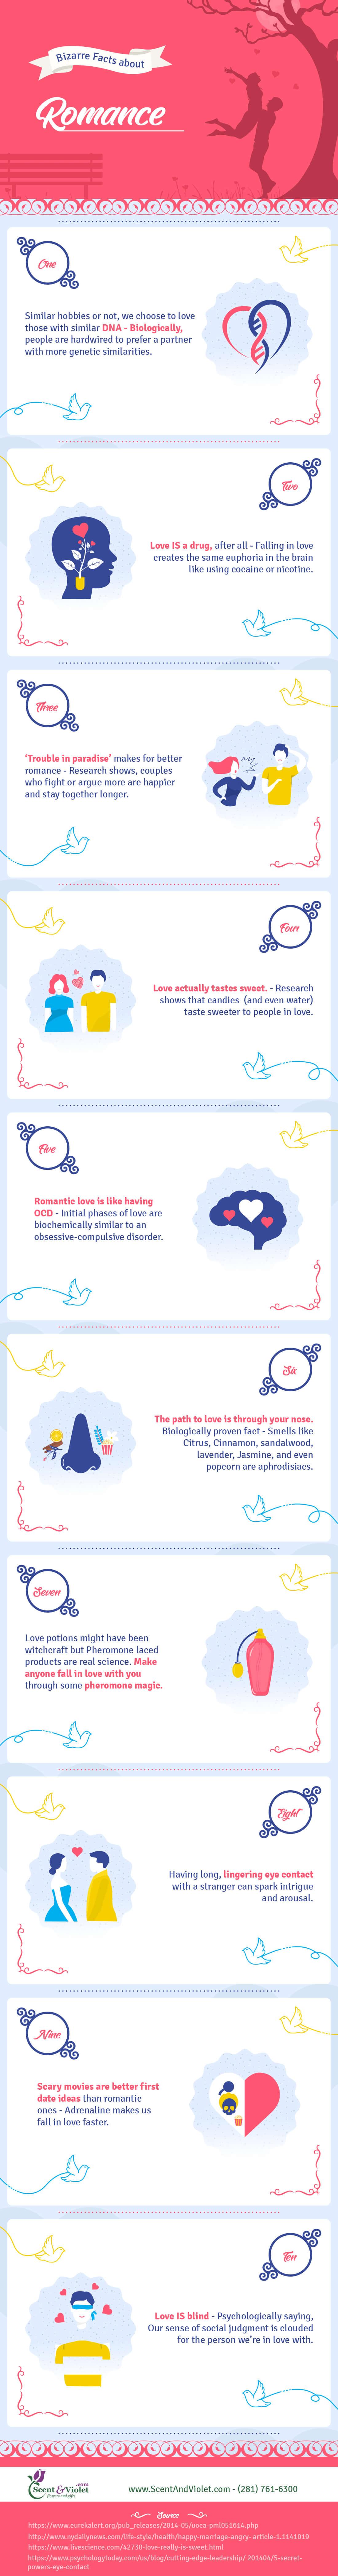 Bizarre_facts_about_romance